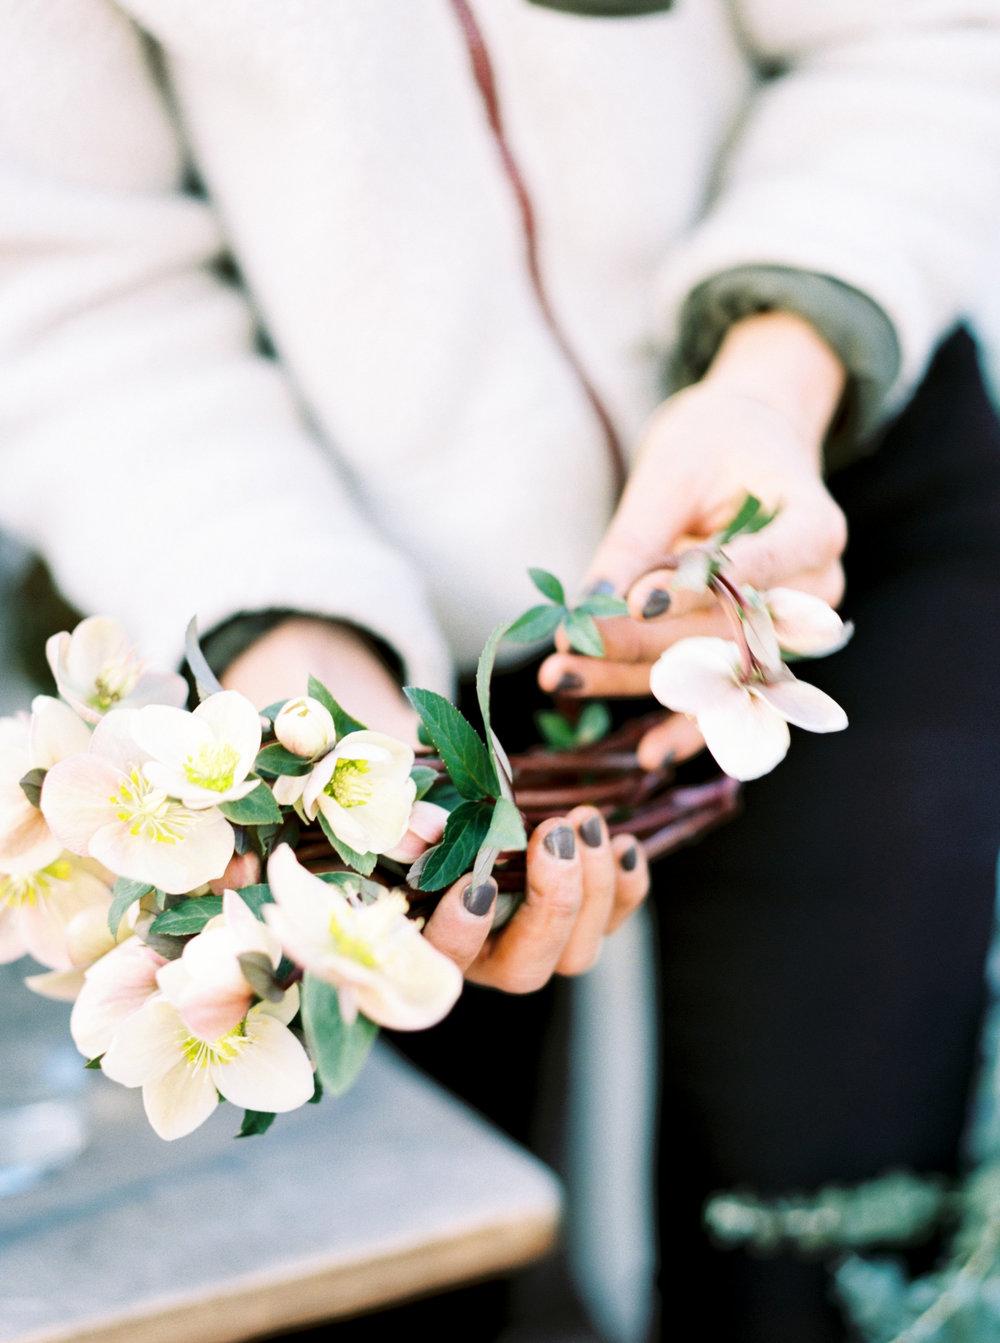 Rachel-Carter-Photography-Denver-Colorado-Film-Florist-Photographer-26.jpg